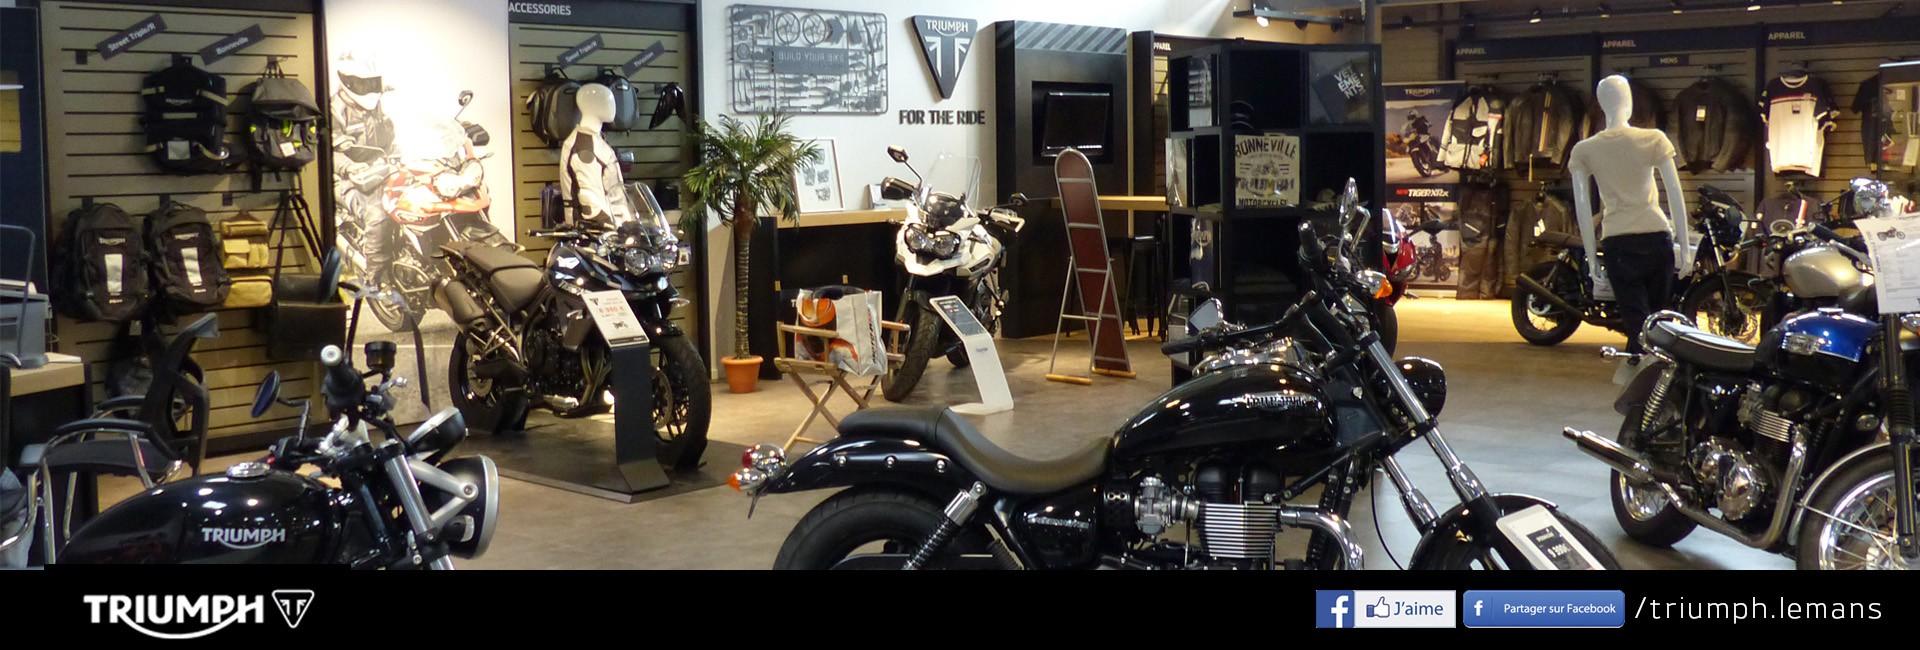 Concessionnaire Le Triumph Yamaha Moto Kawasaki Ducati Mans pwqgEwA